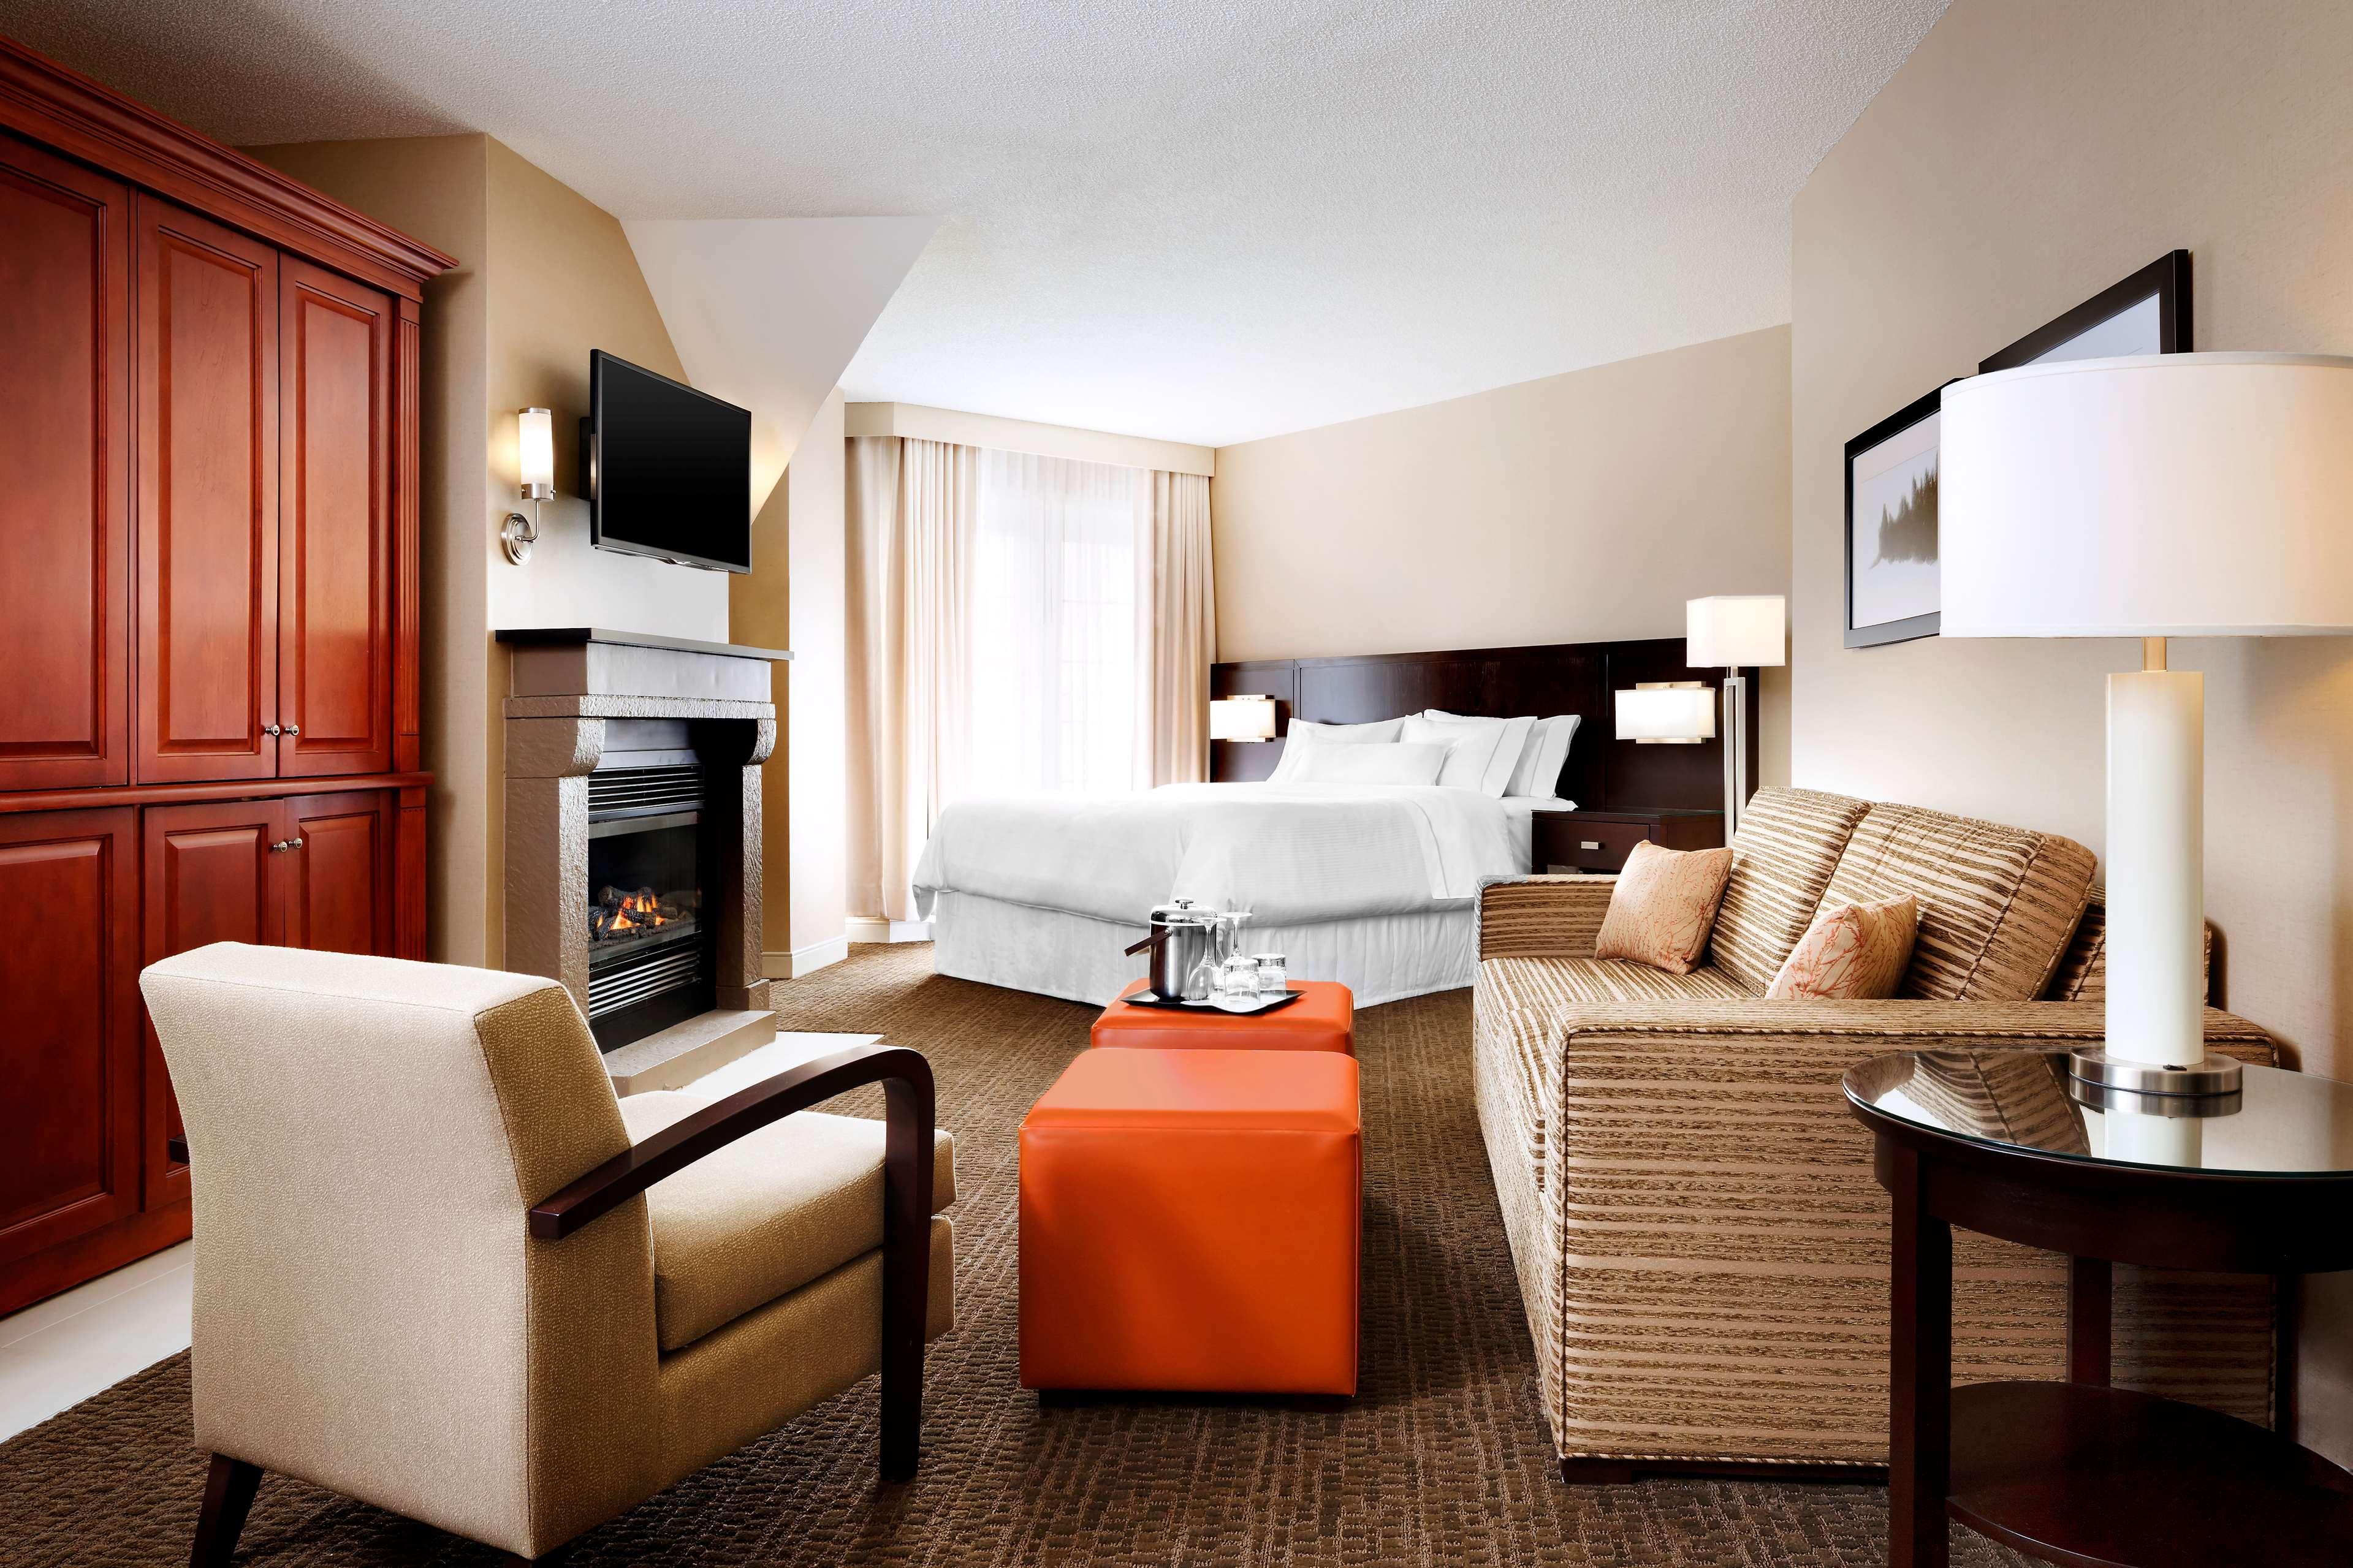 Le Westin Resort & Spa, Tremblant, Quebec à Mont Tremblant: Deluxe Hotel Room